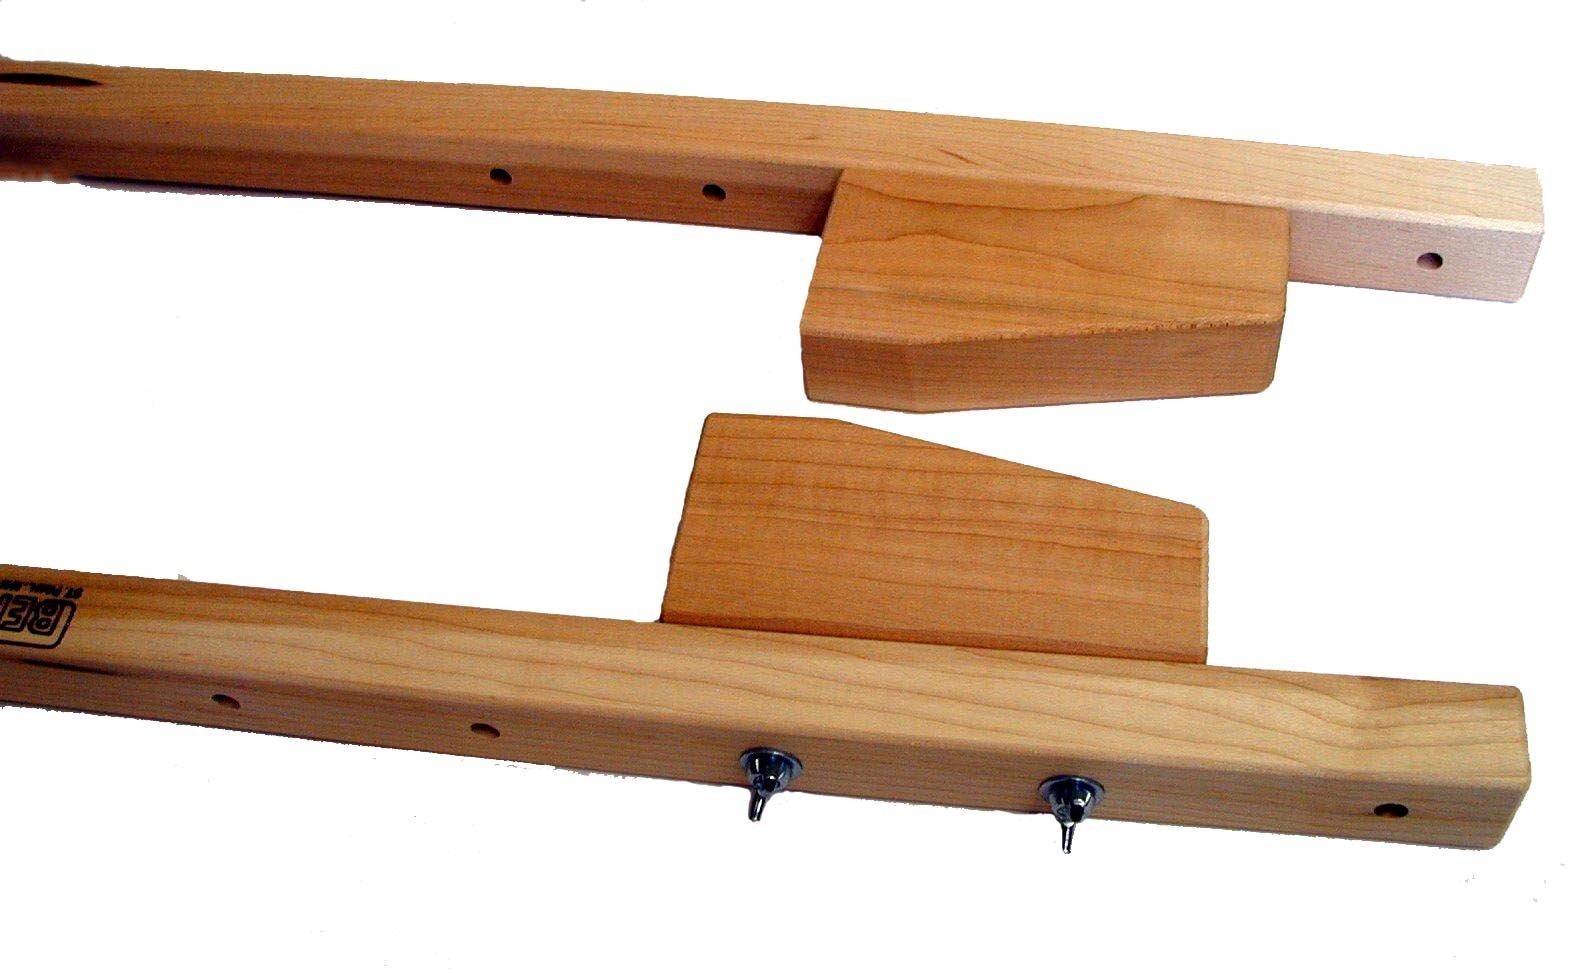 Beka 08805 Traditional Wooden Stilts - Tall by Beka by Beka